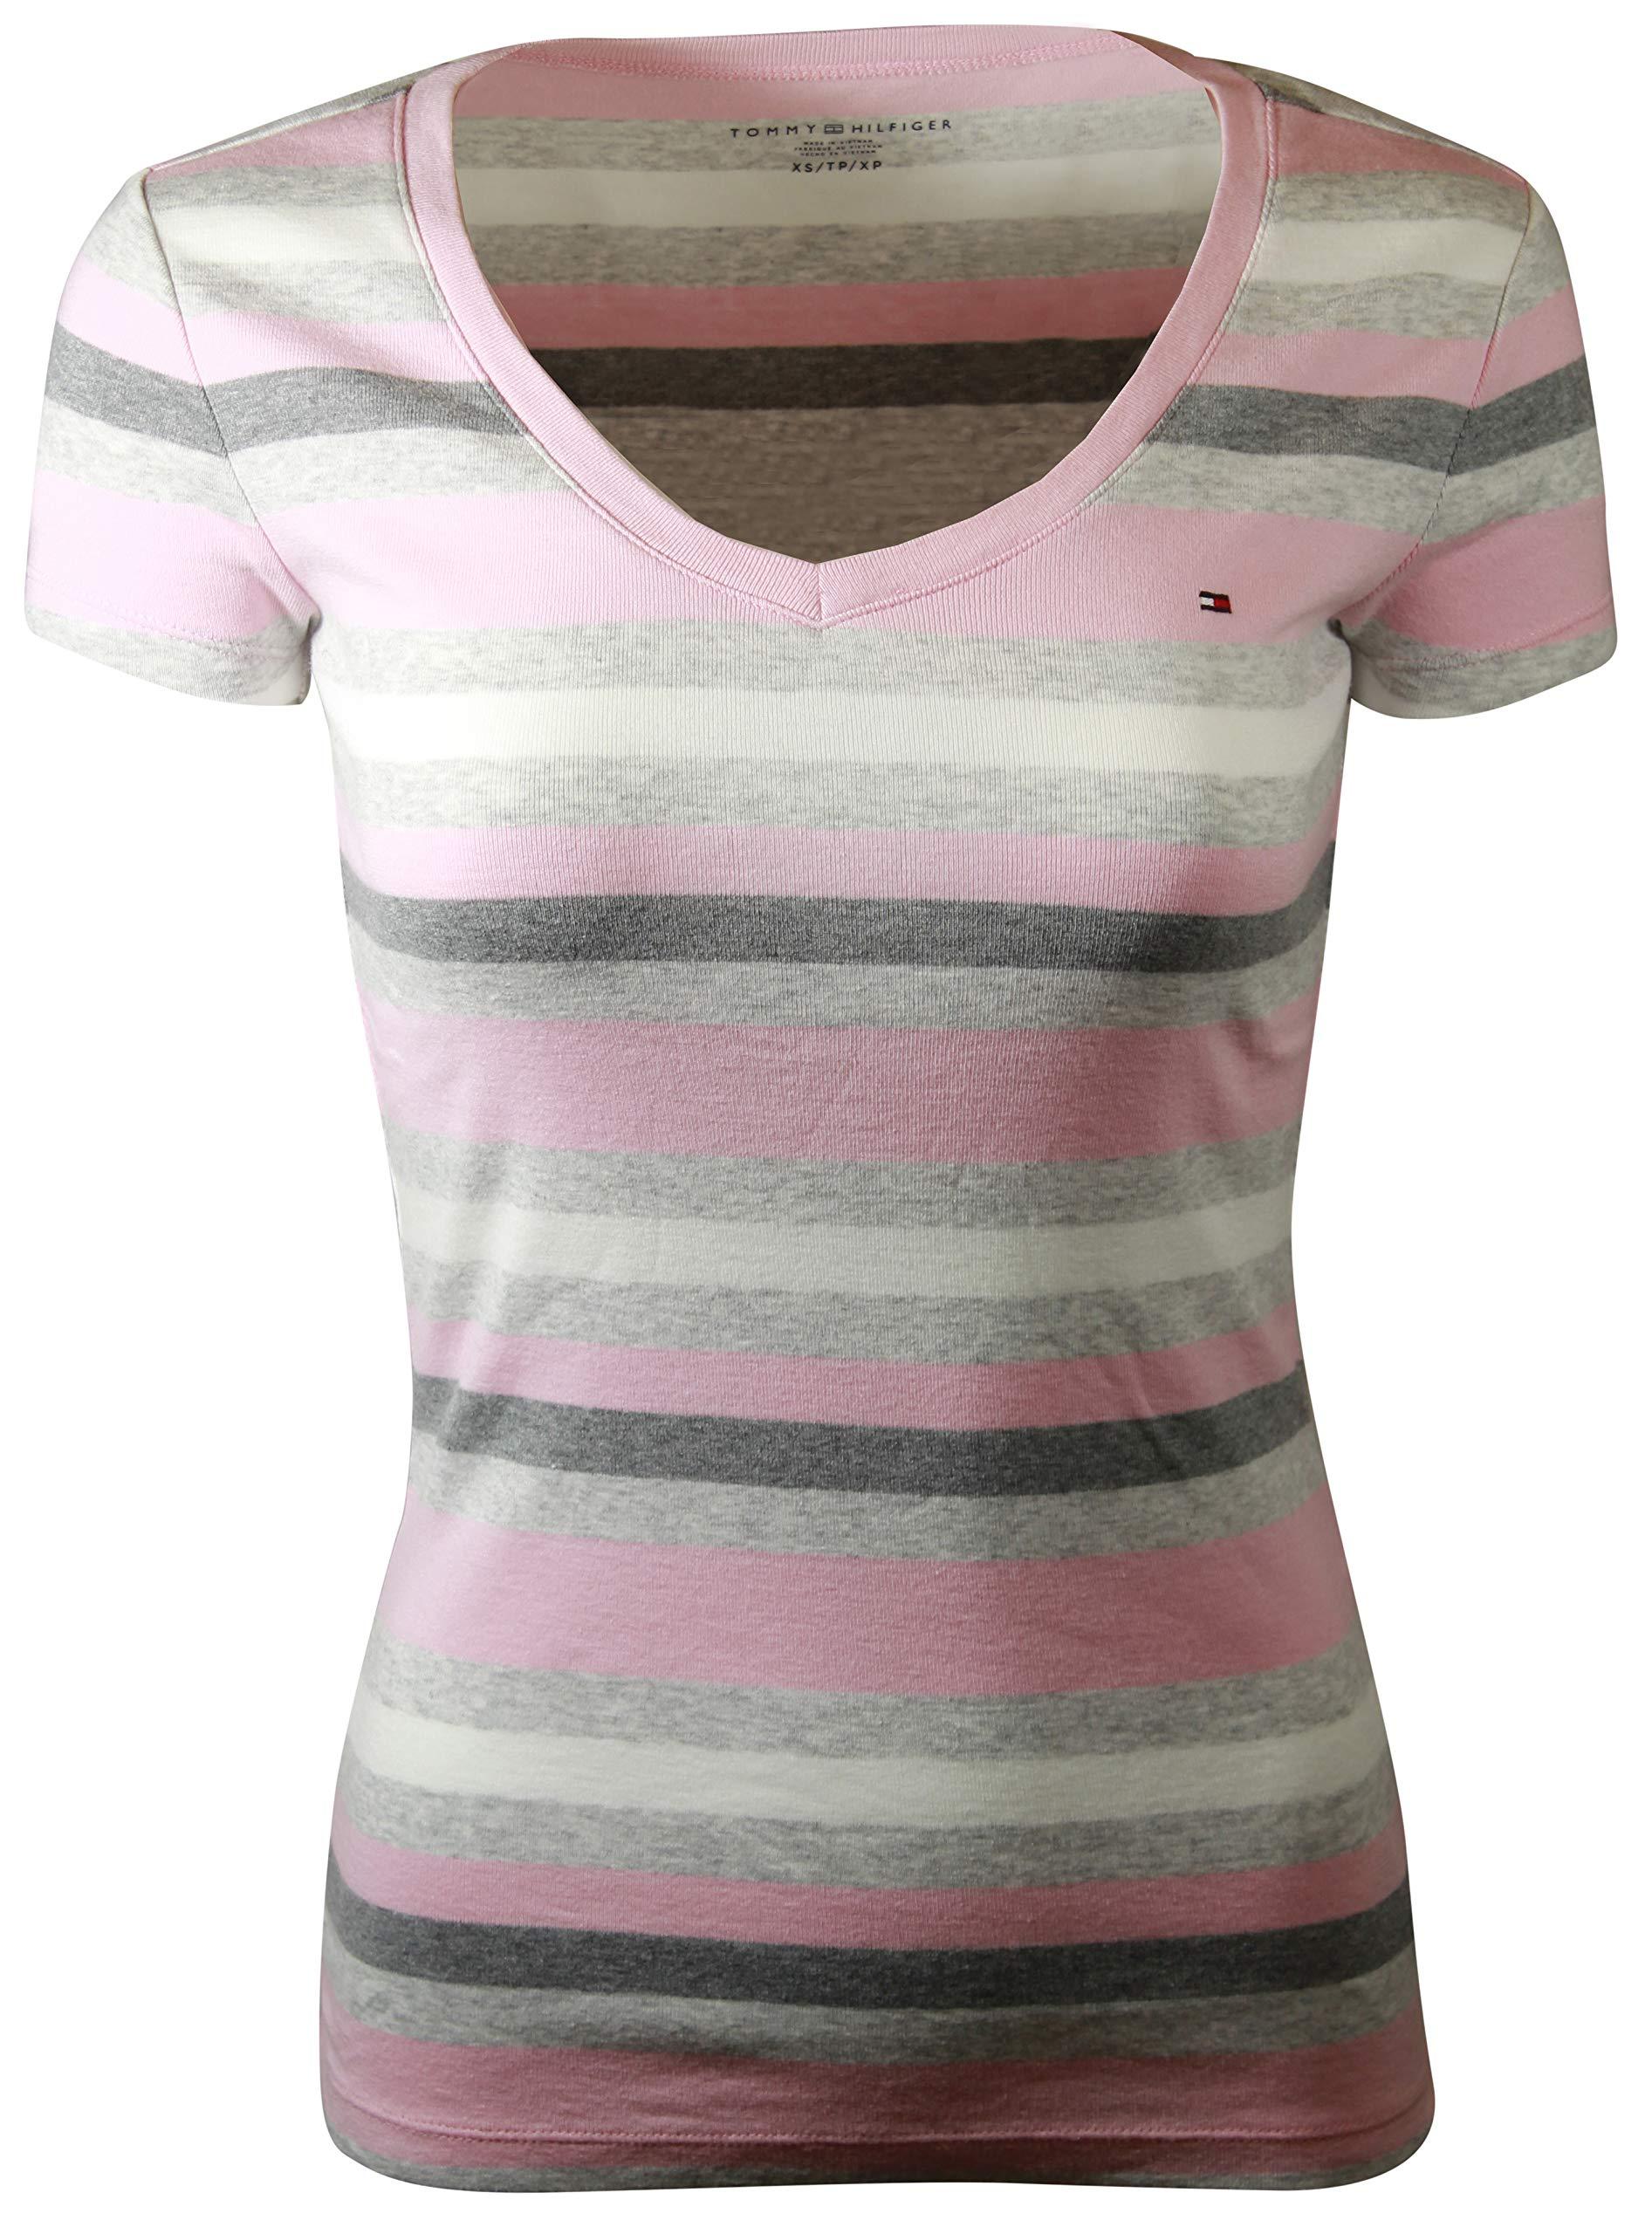 b67d00cf Galleon - Tommy Hilfiger Womens V-Neck Solid Color Logo T-Shirt (Small,  Pink/Grey/Light Grey)